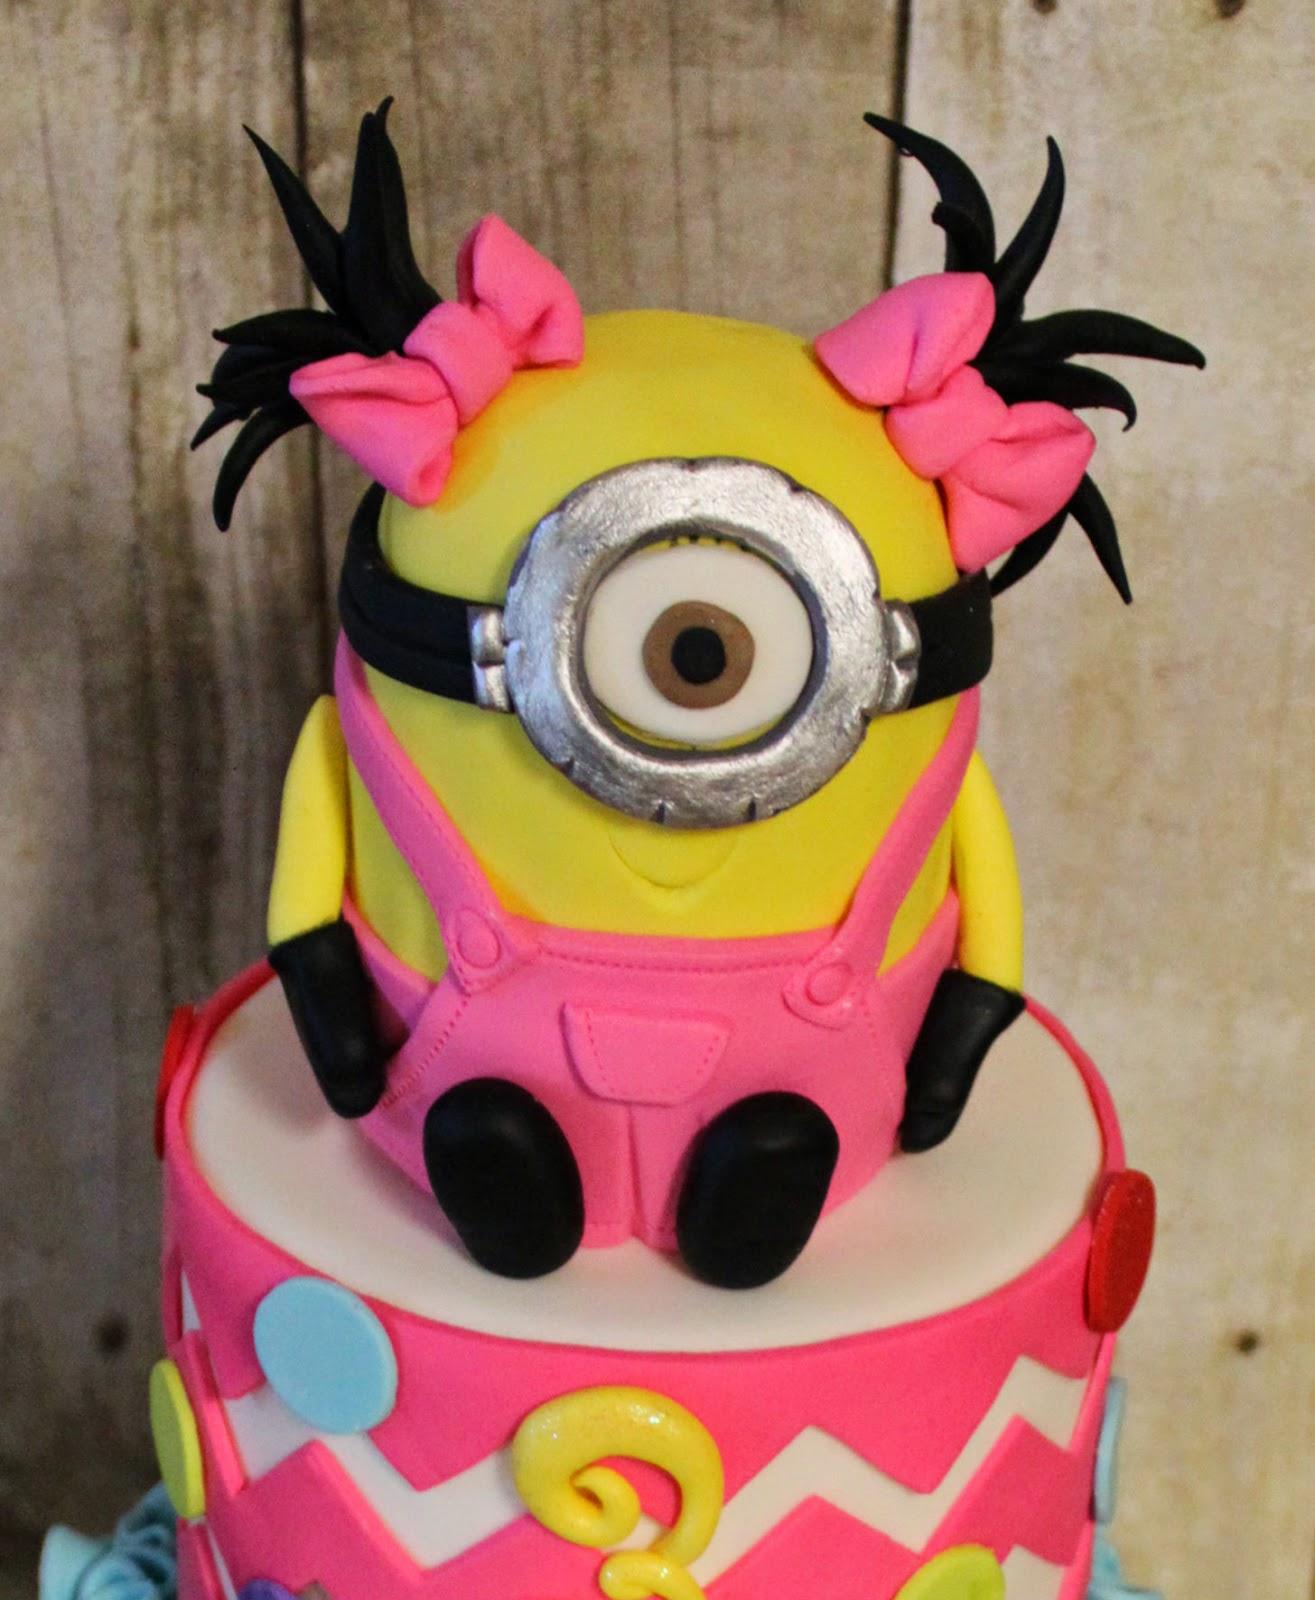 Minnion Inspired birthday cake